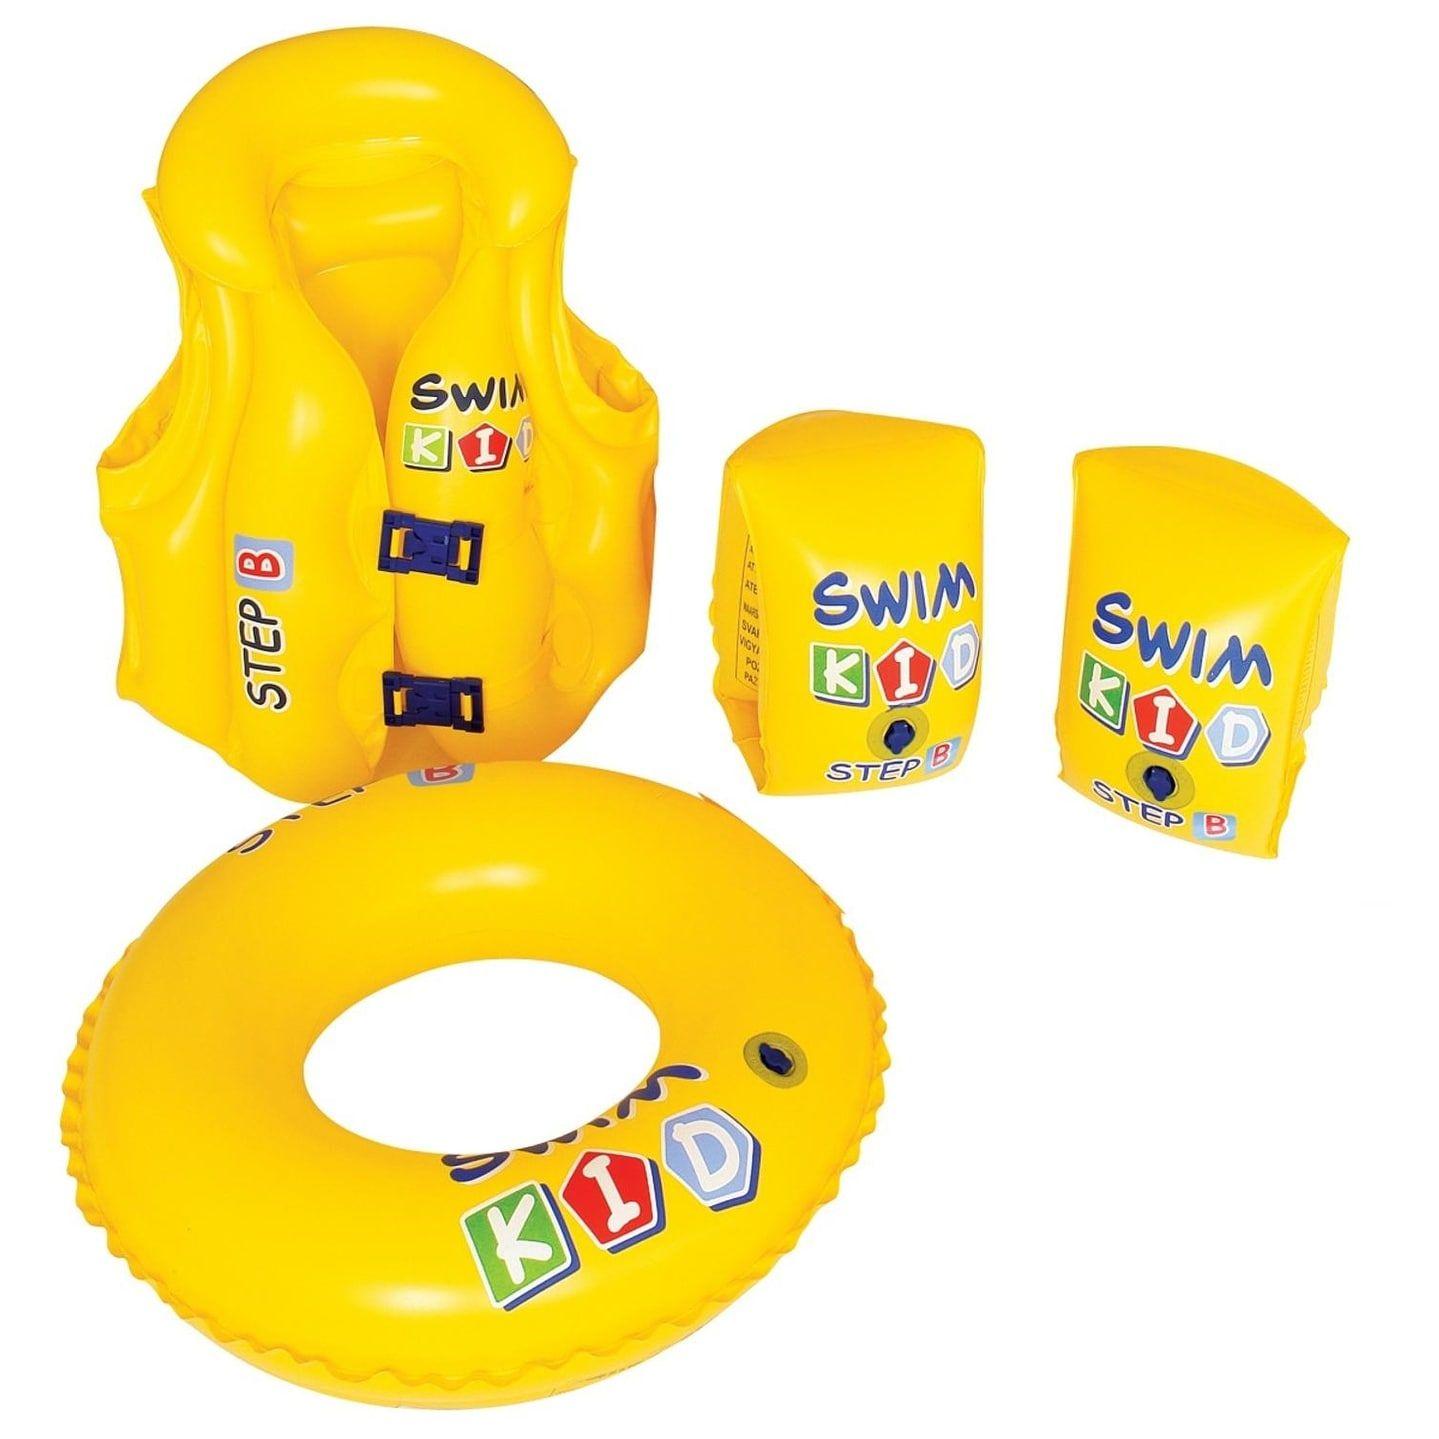 ACSTERB Inflatable Water Flotation Swim Waist Belt Swim Vests and Arm Bands S... Spielzeug für draußen